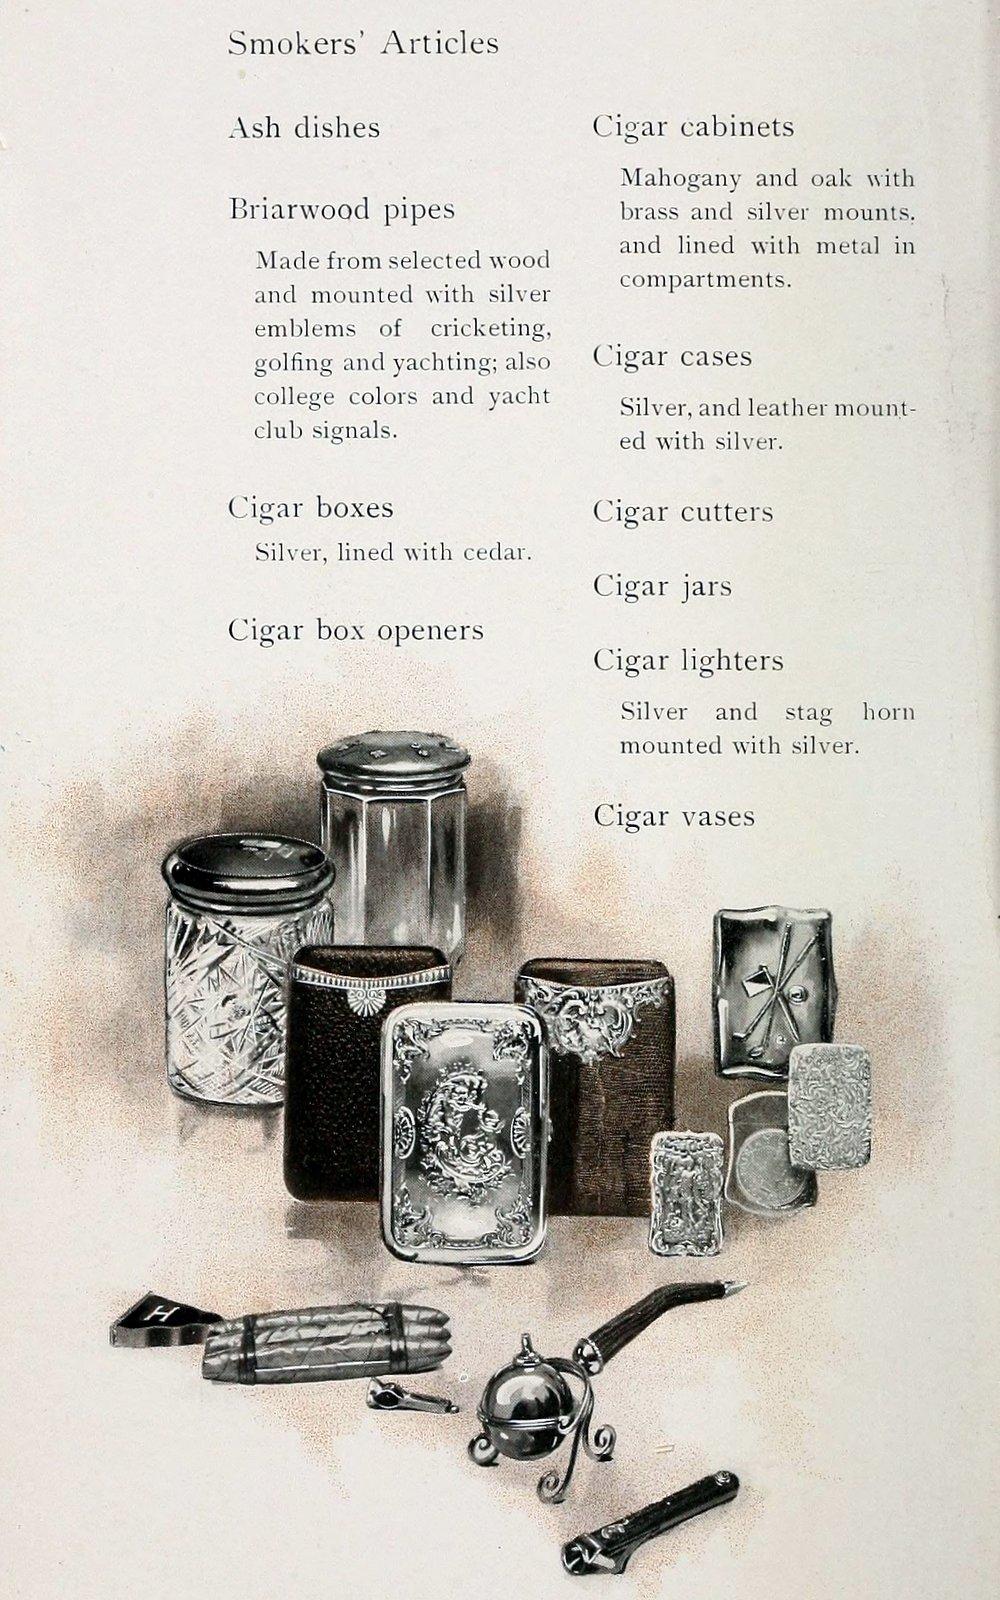 Smoker's Articles